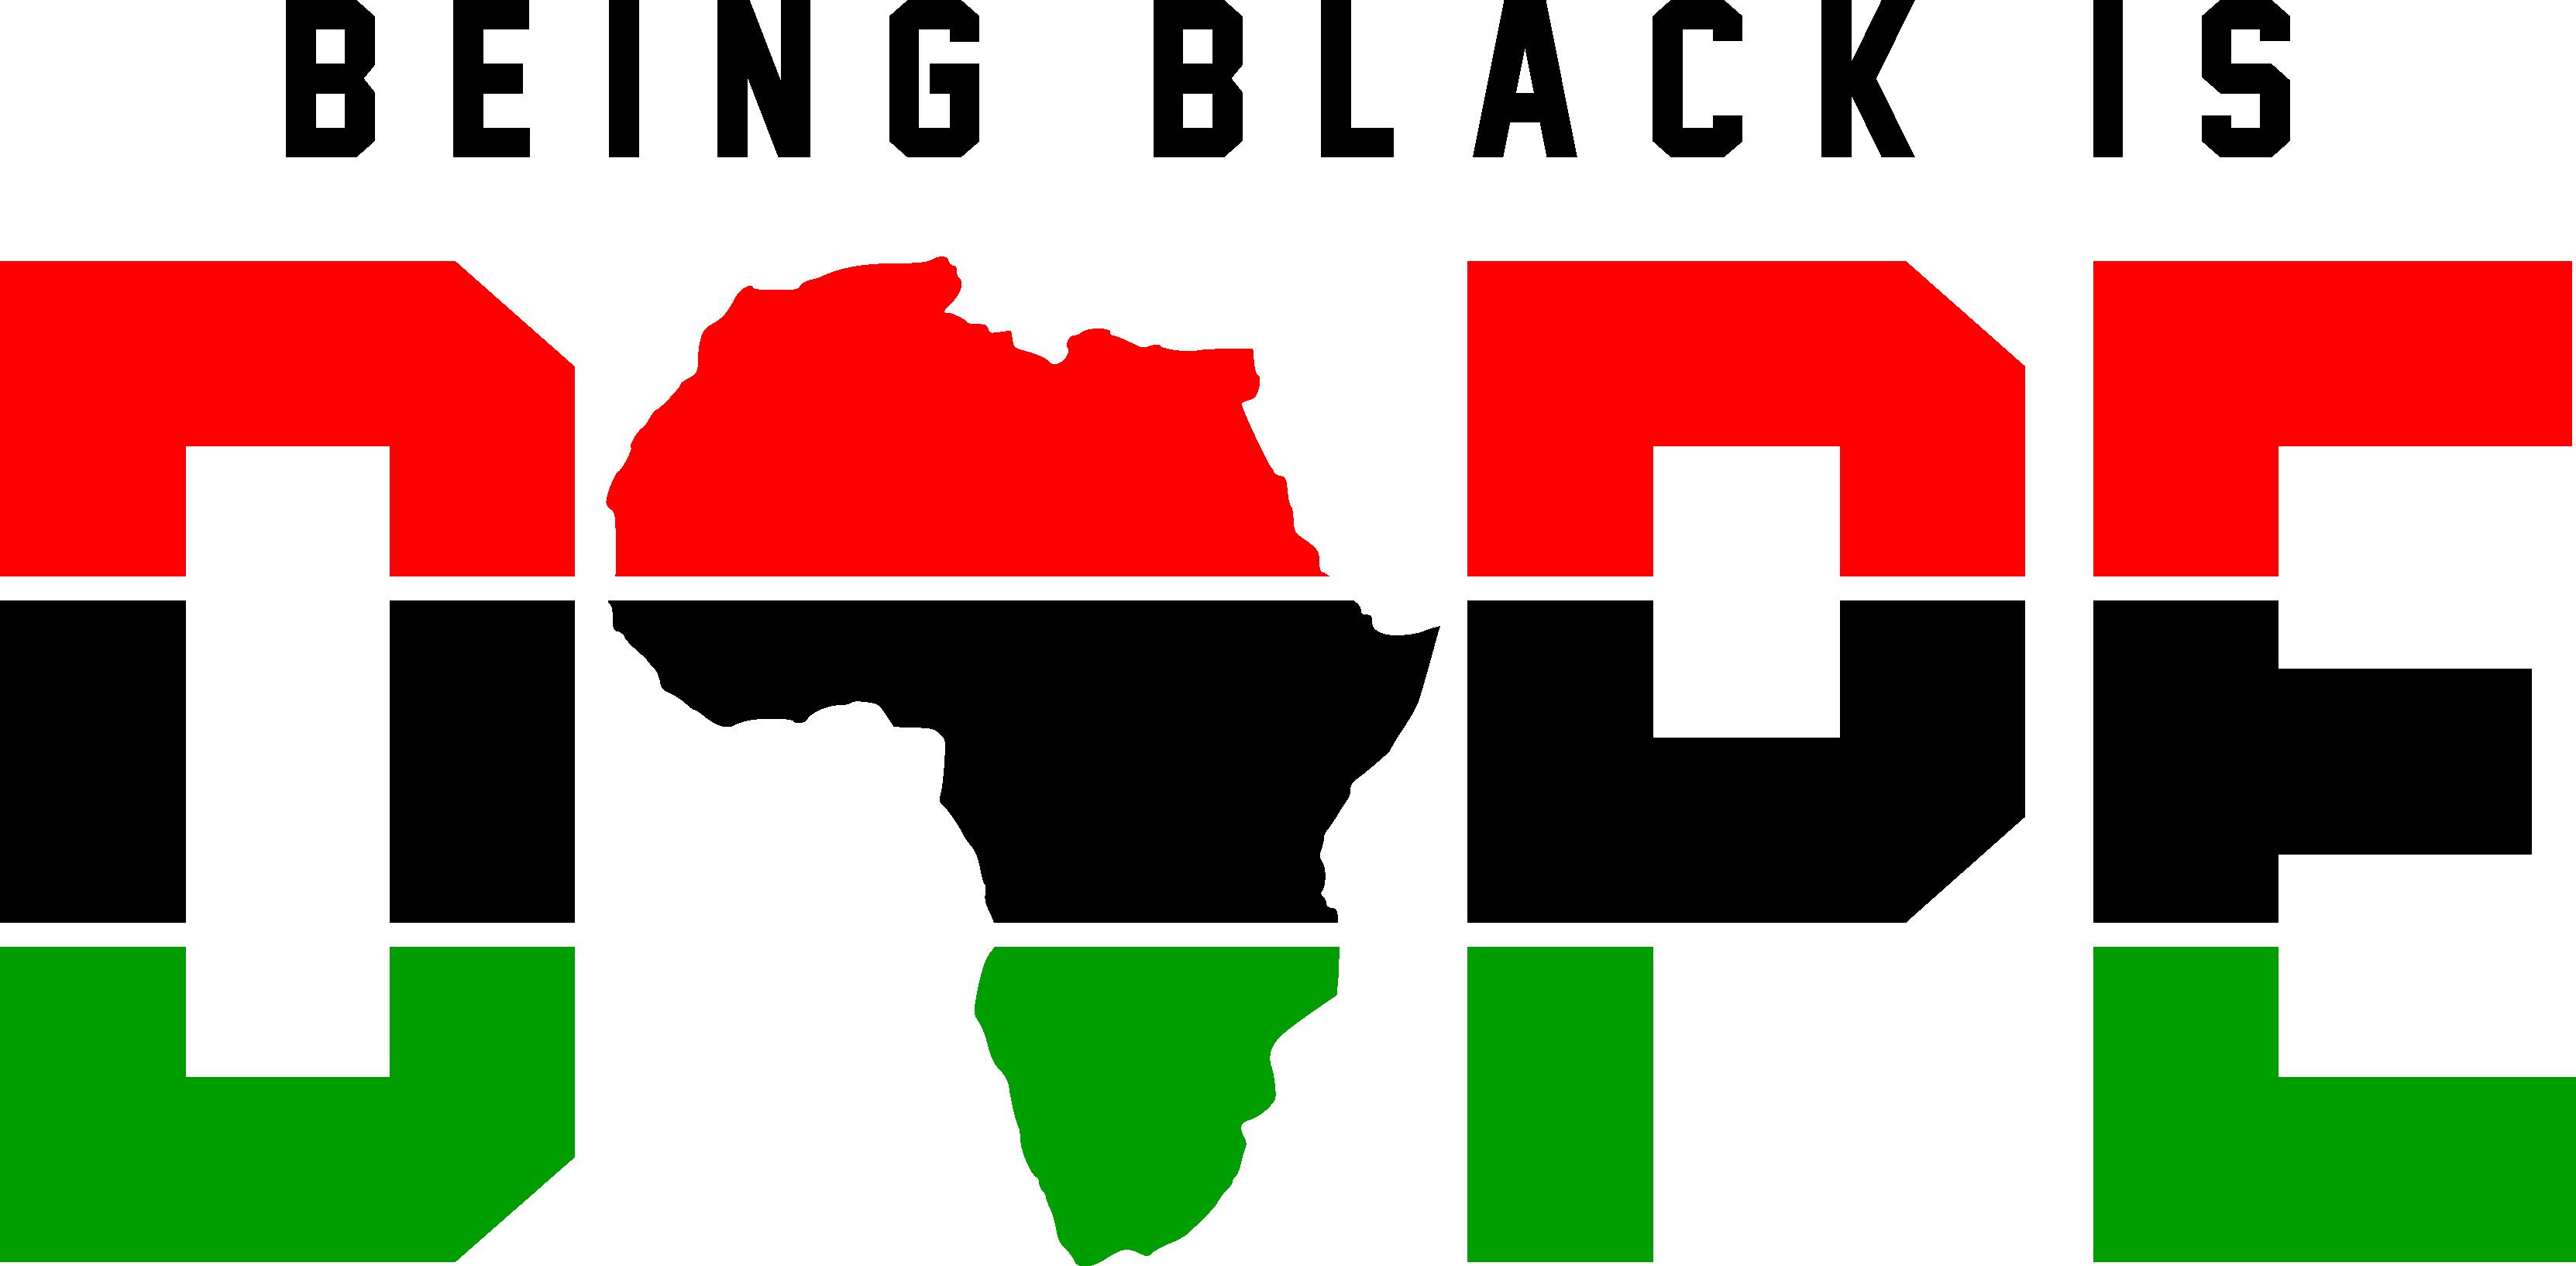 Beingblackisdopeafrica